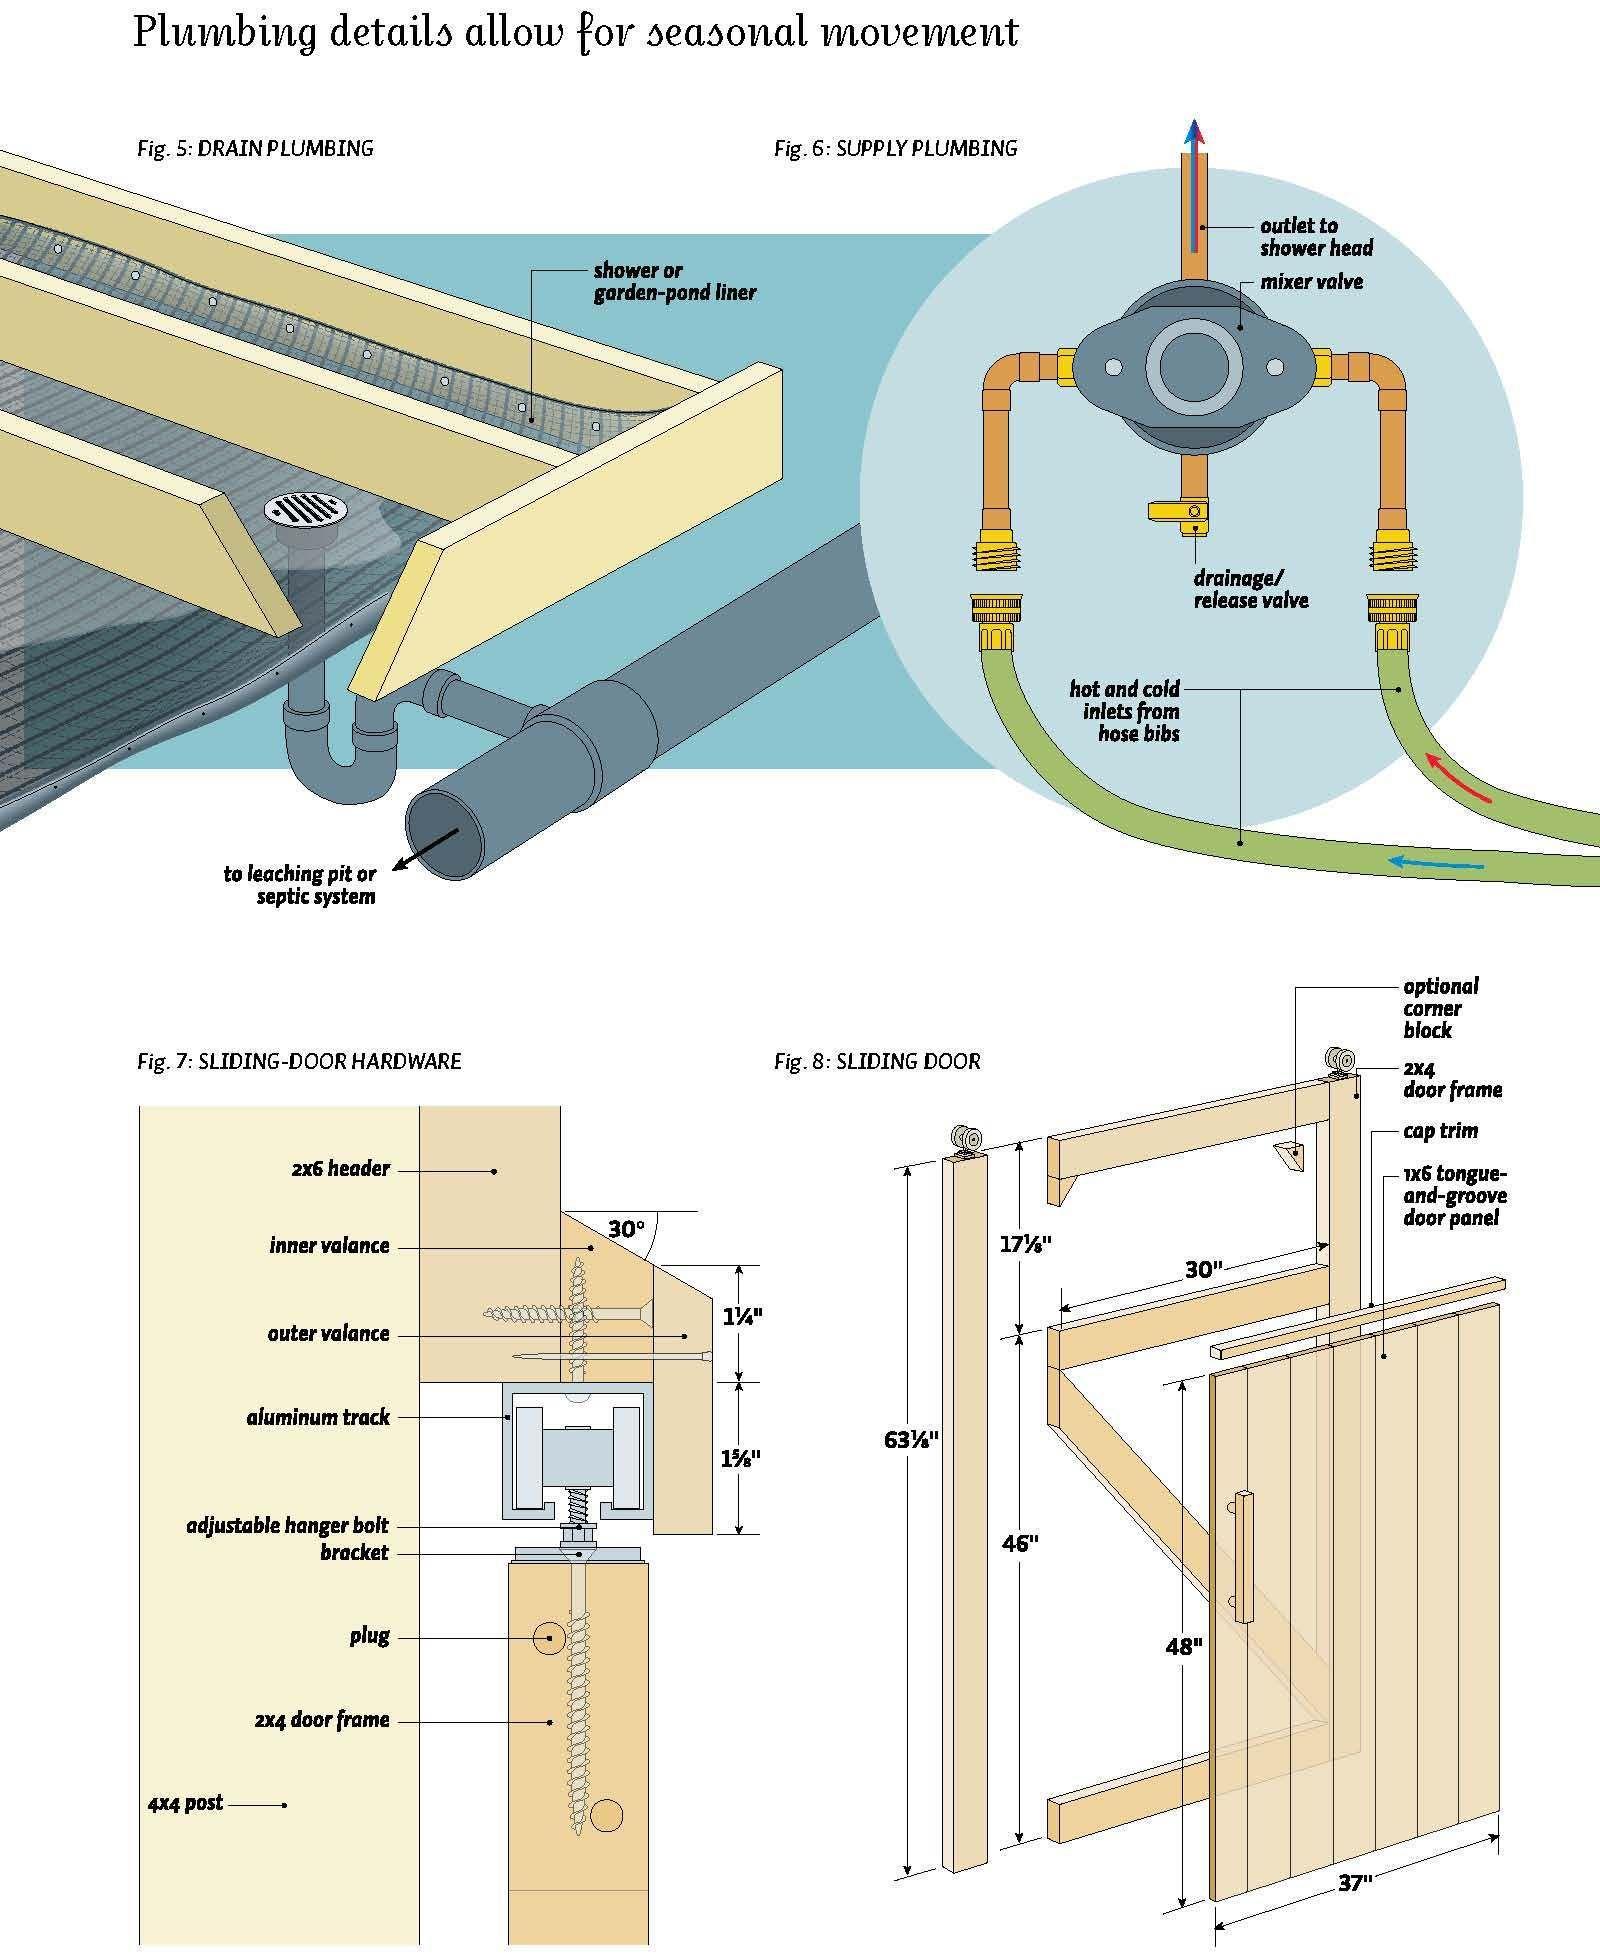 outdoor shower base drain